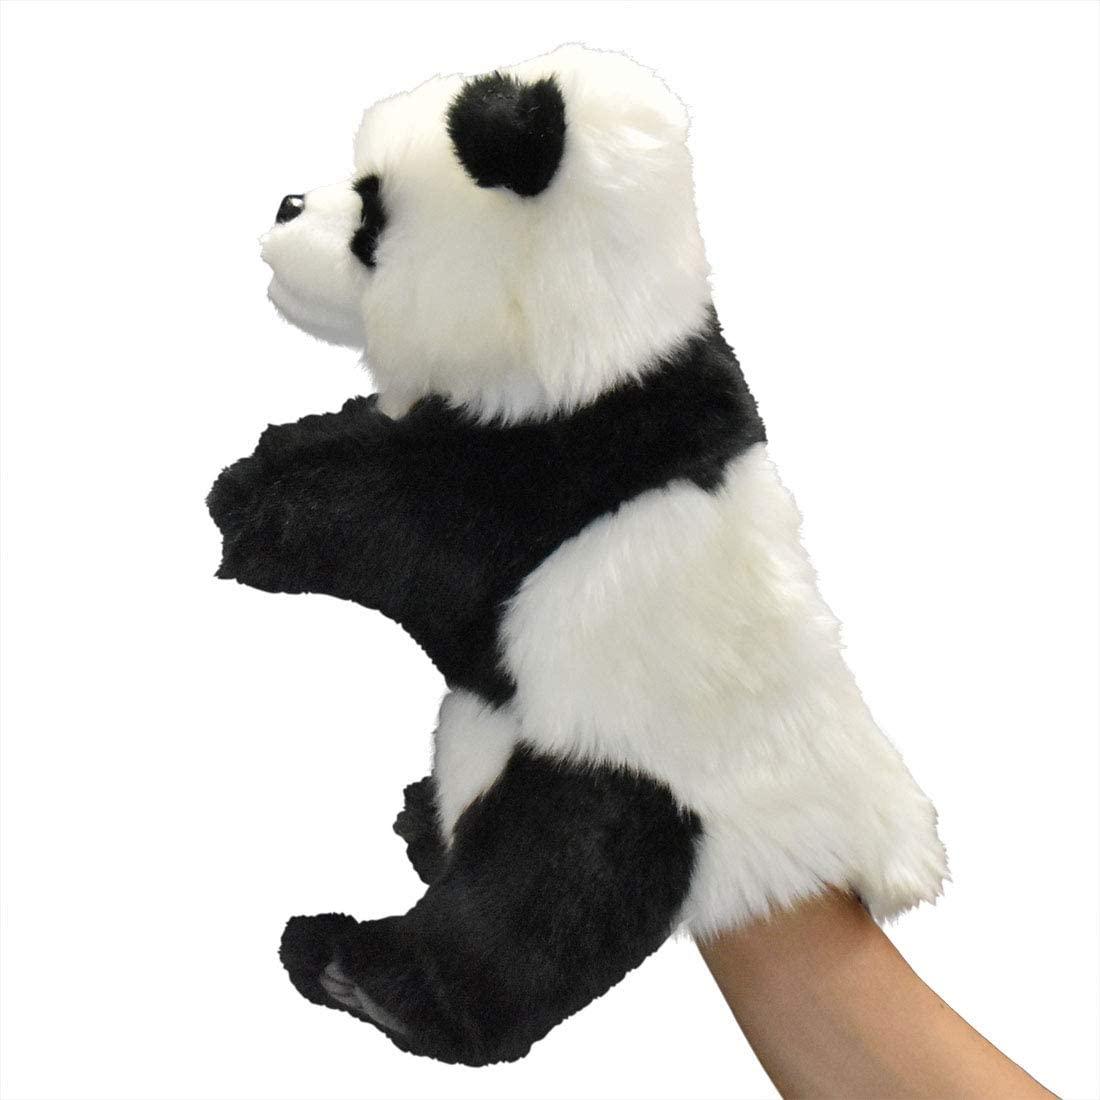 Handpuppe Panda originalgetreu 30cm PandabärTheaterpuppe Hansa 7165 Seite Links